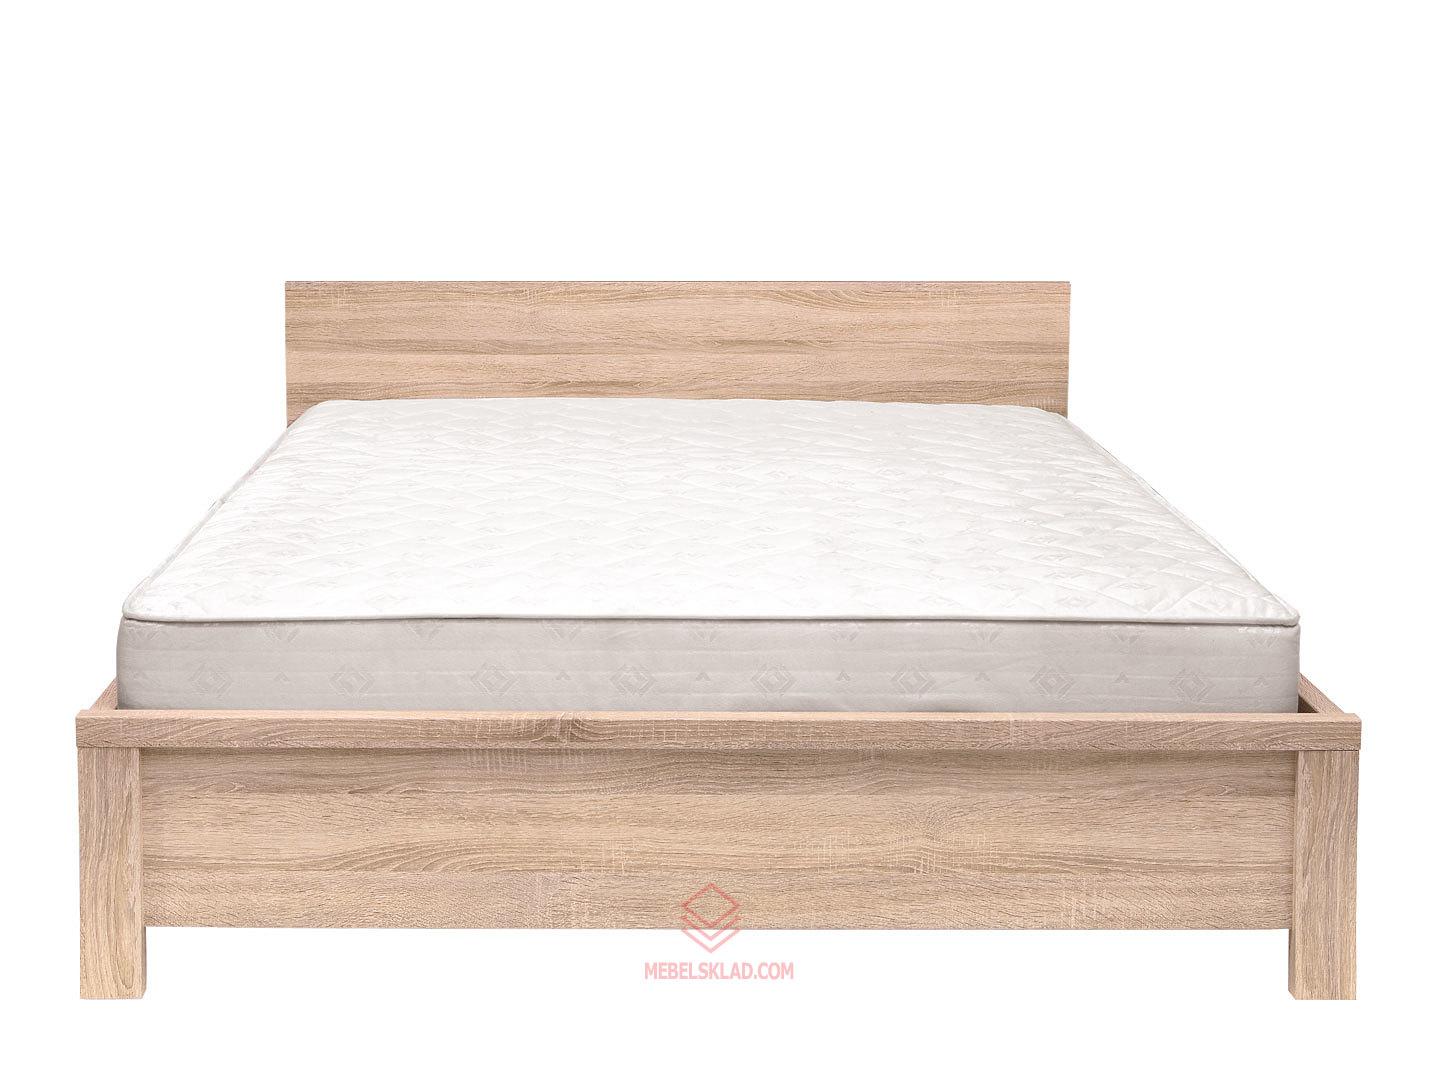 Кровать LOZ160х200_2 дуб сонома КАСПИАН - гибкое основание за 17480 ₽